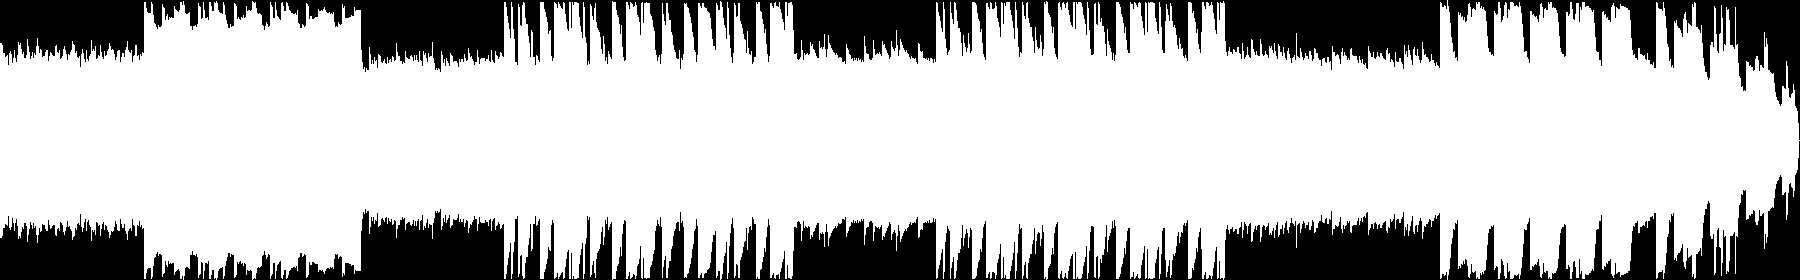 Dark Trap Keys audio waveform